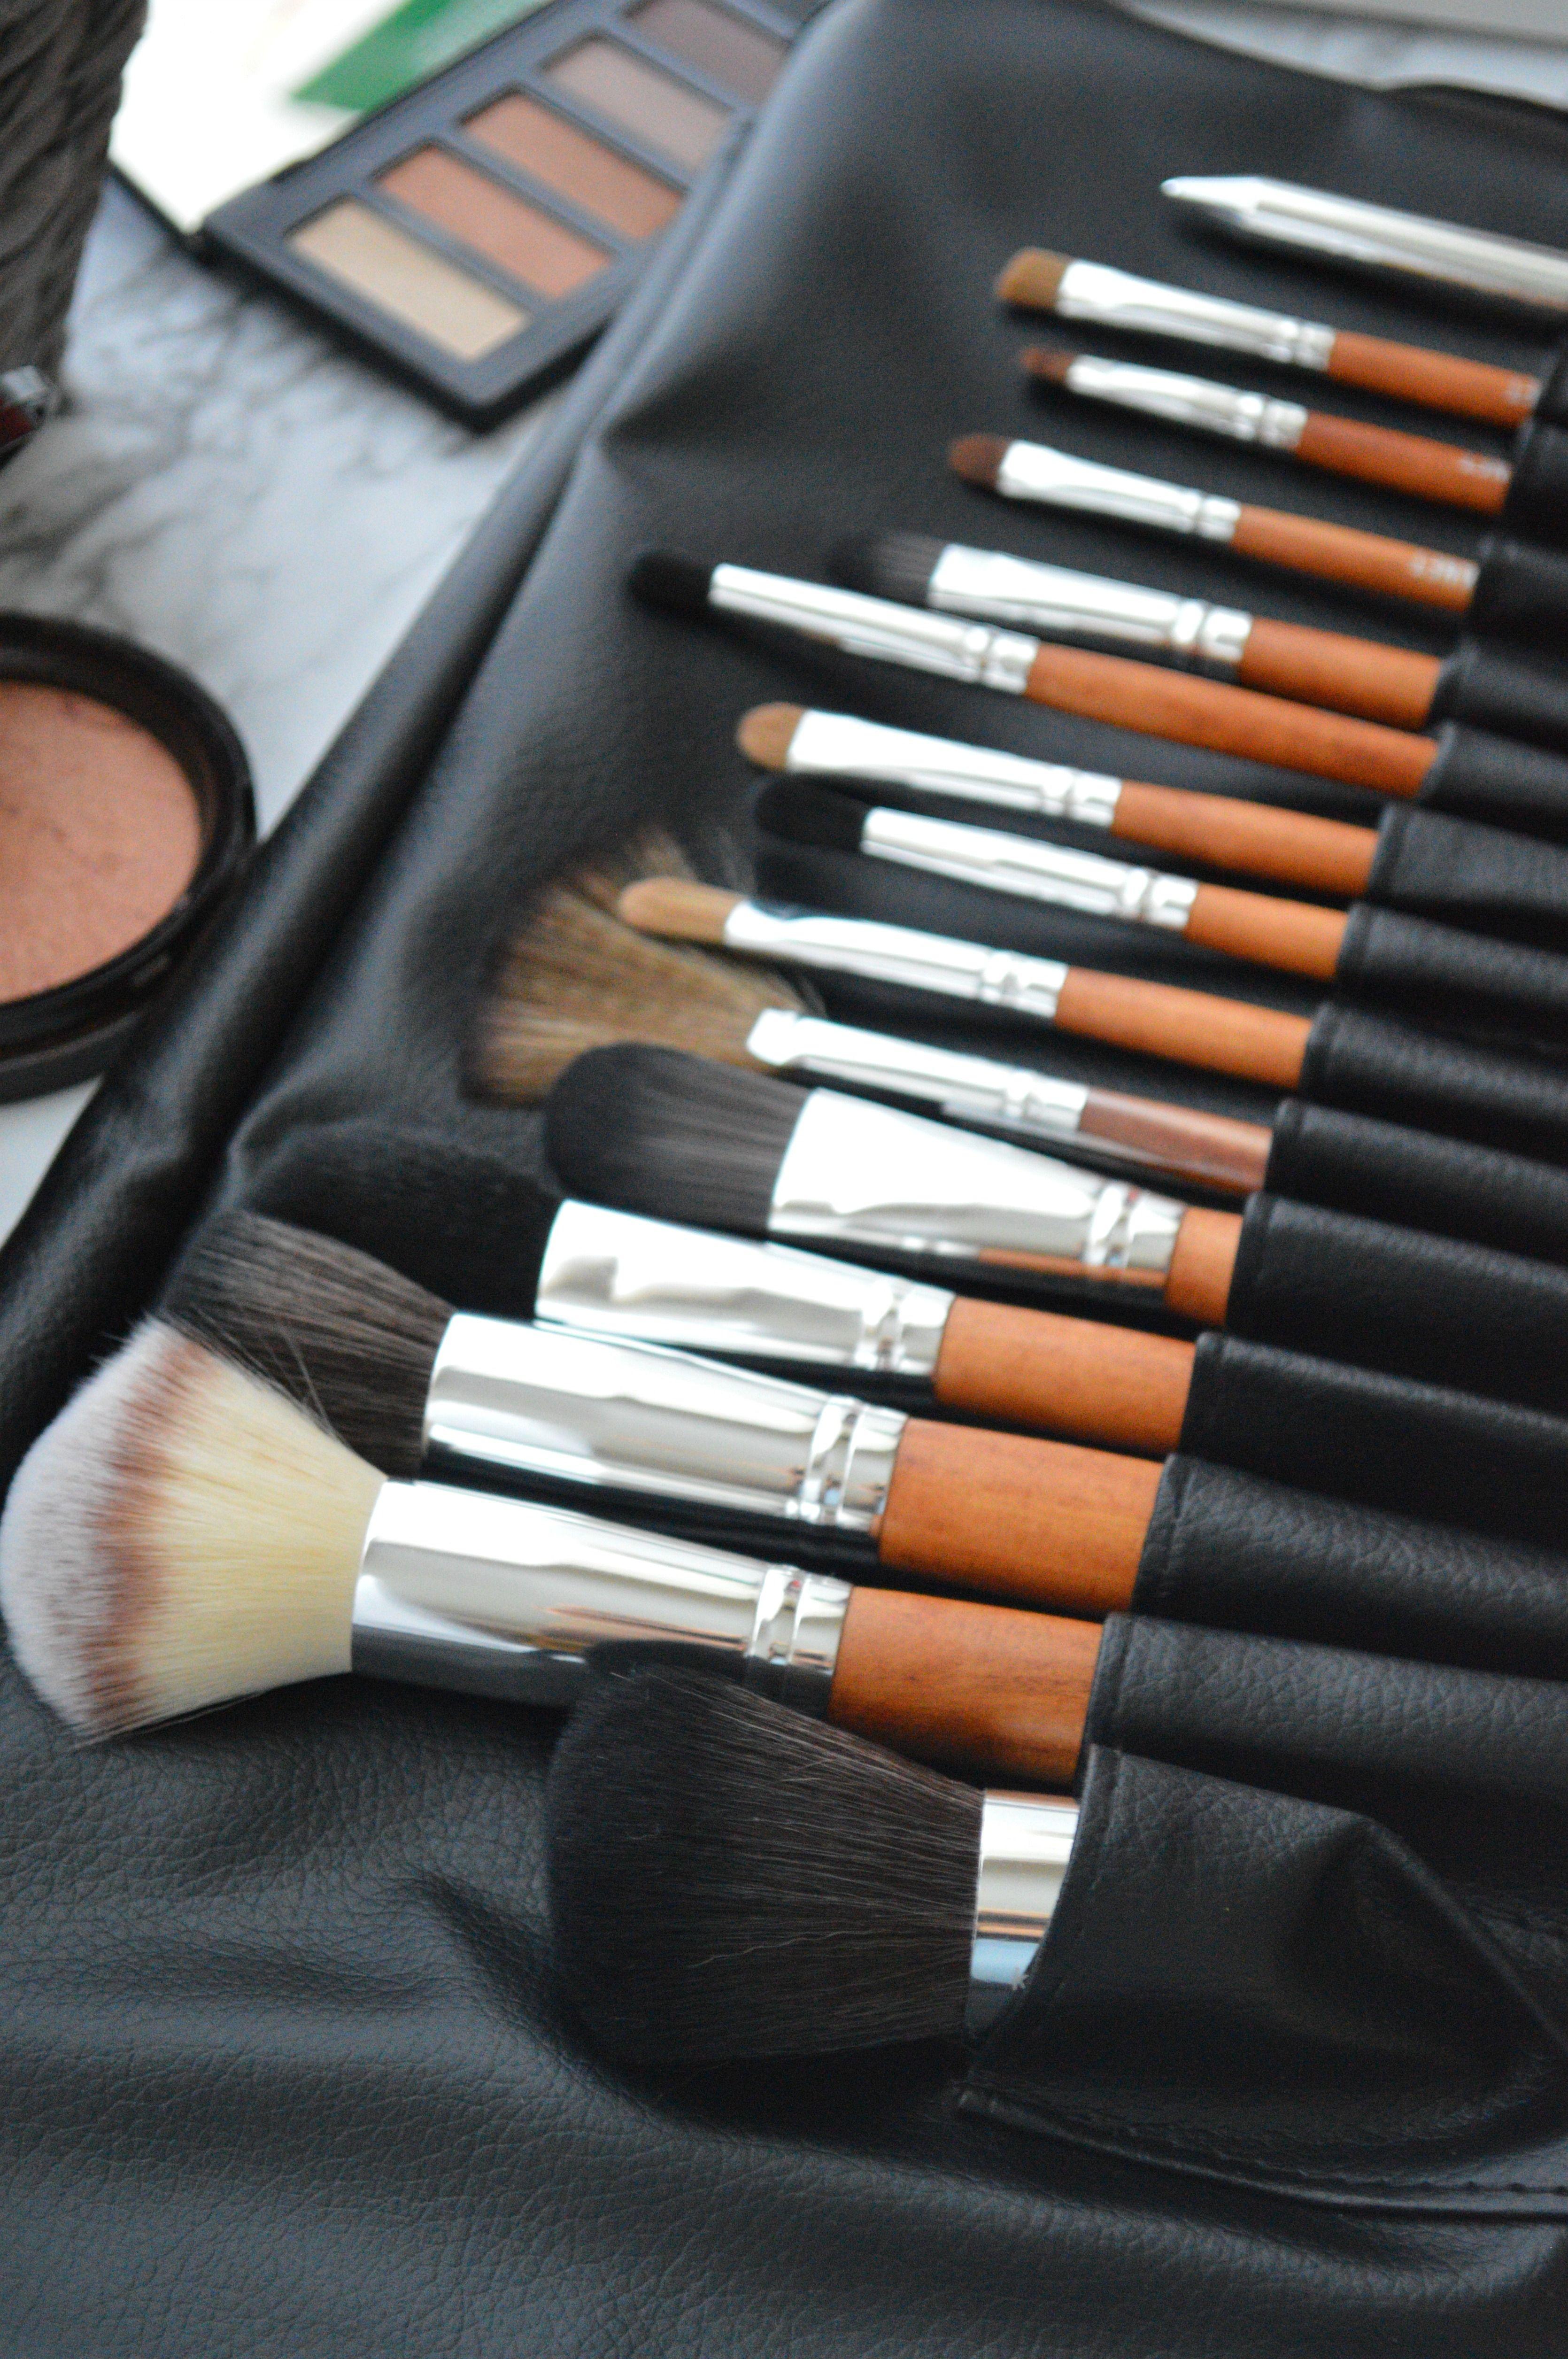 Vanity Makeup Brush Collection + Vibrating Flat